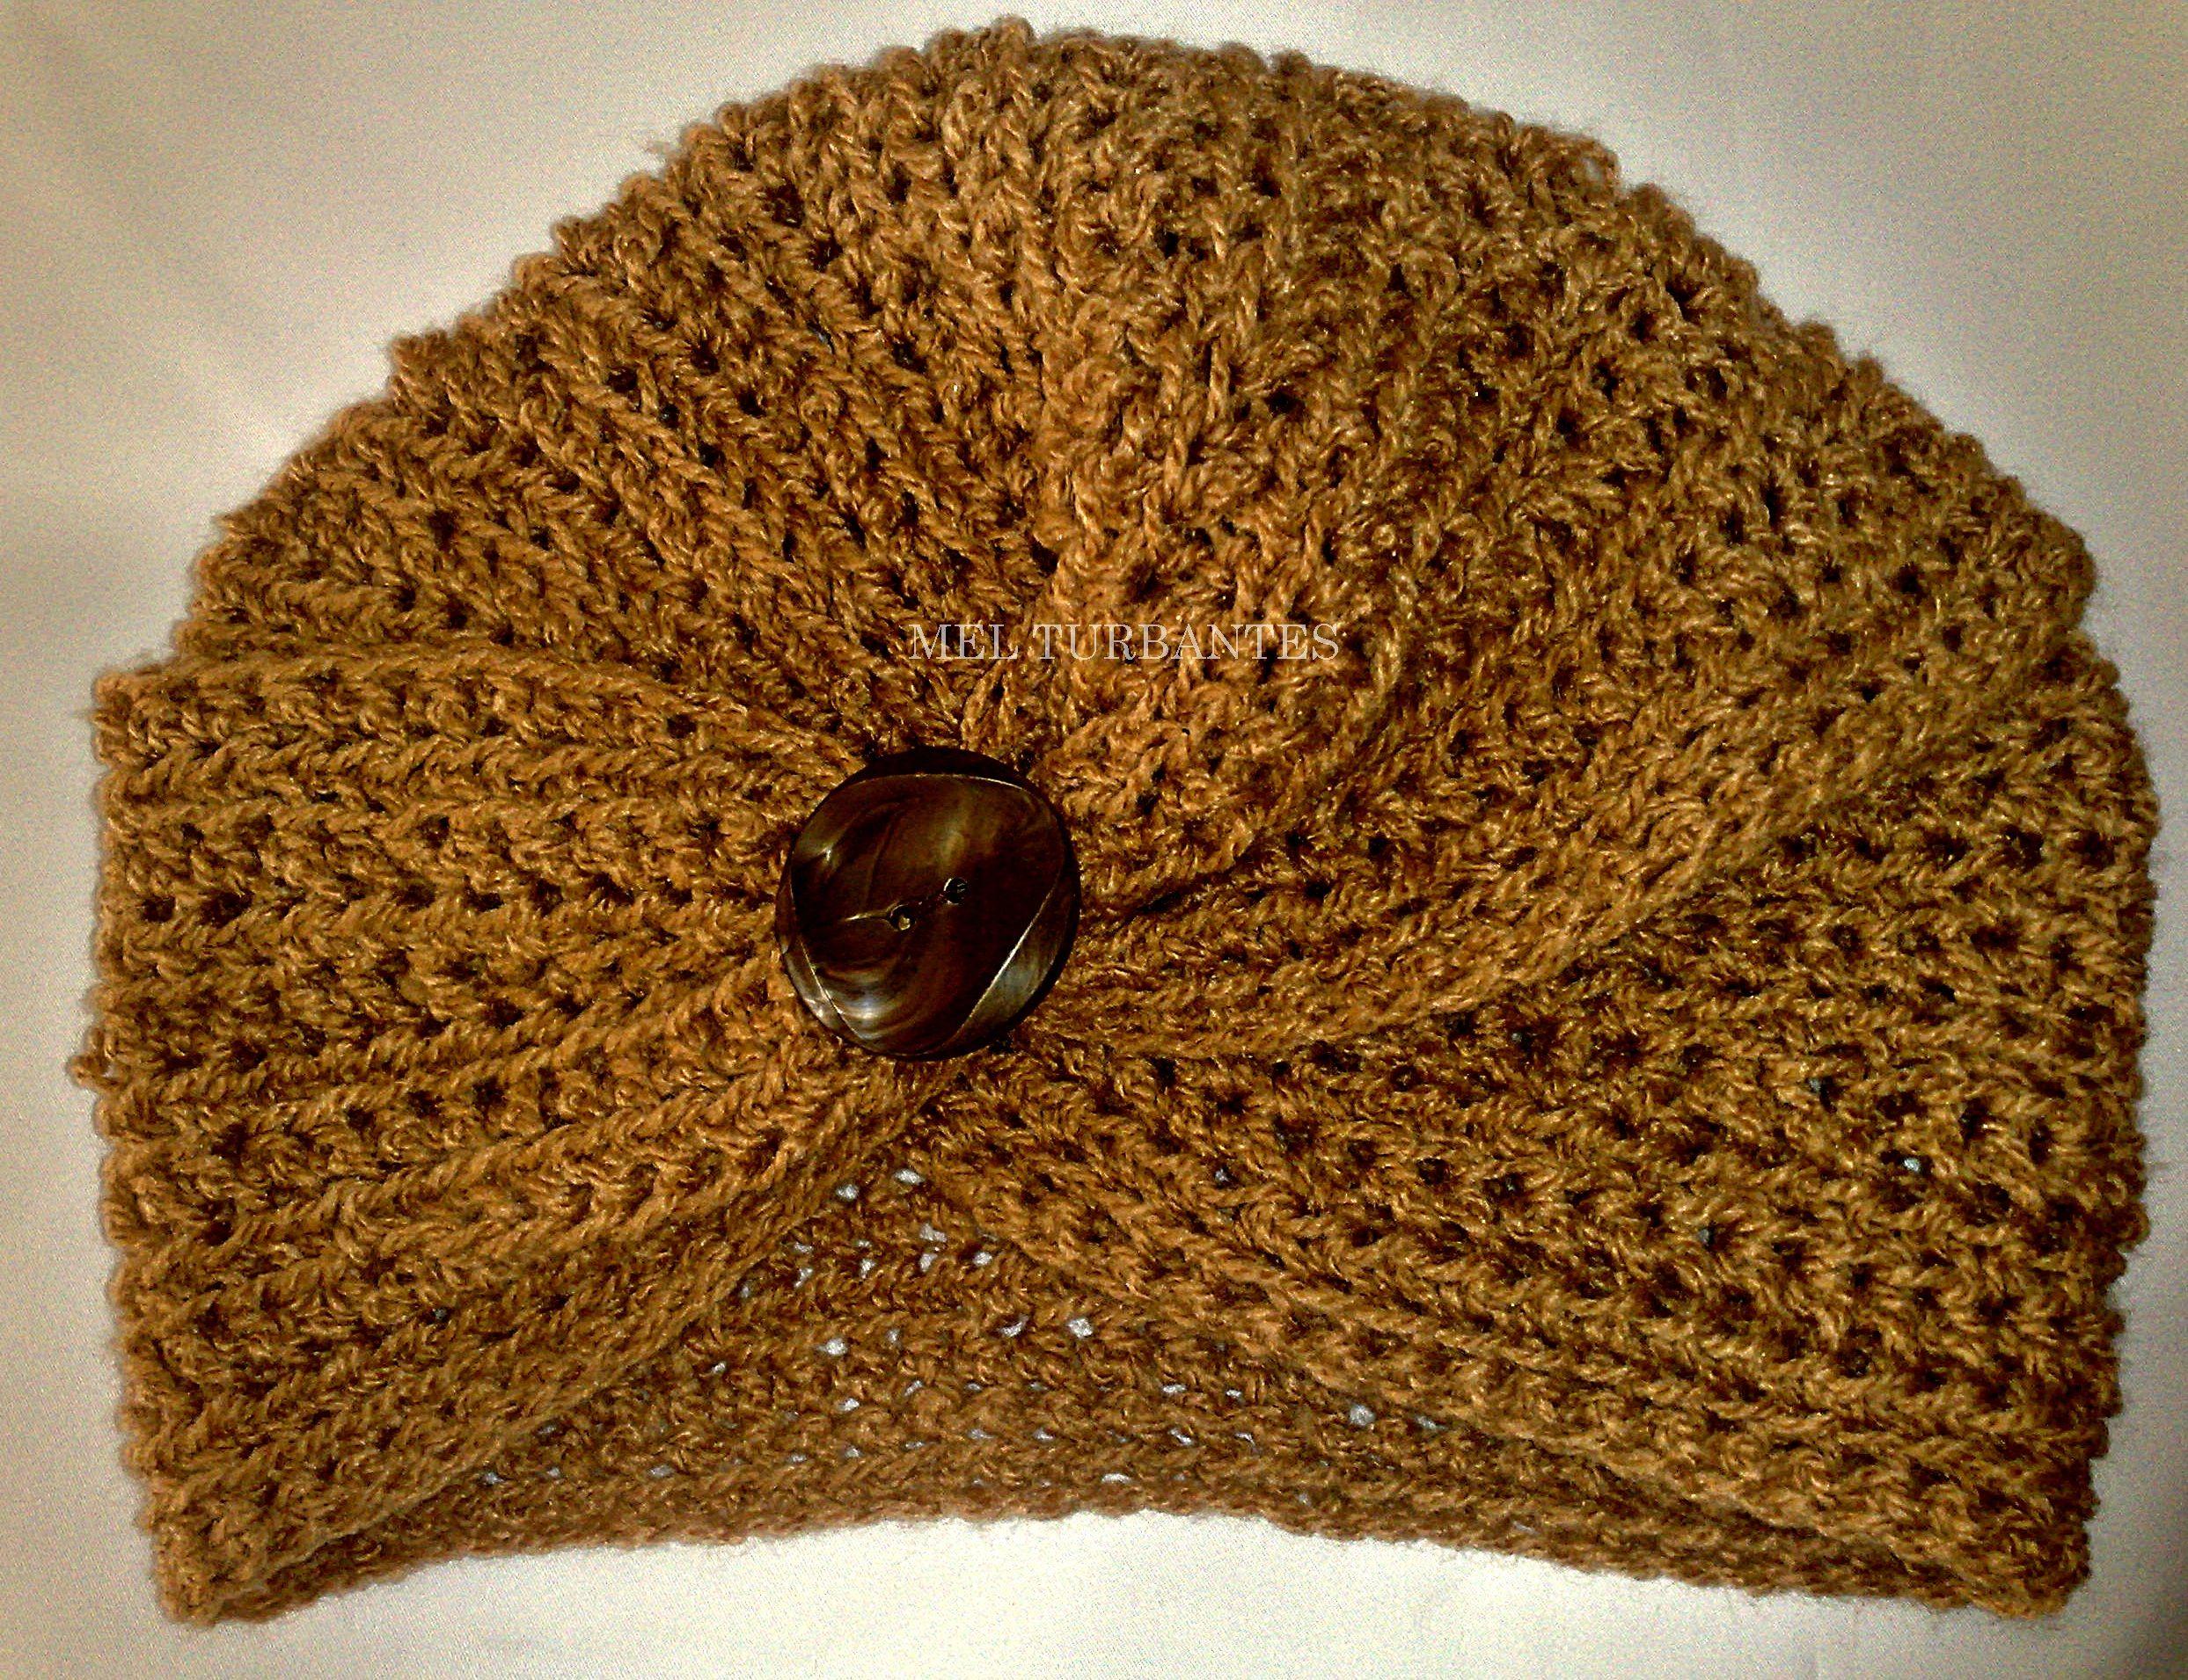 turbante color habano con detalle de botón | turbantes tejidos ...